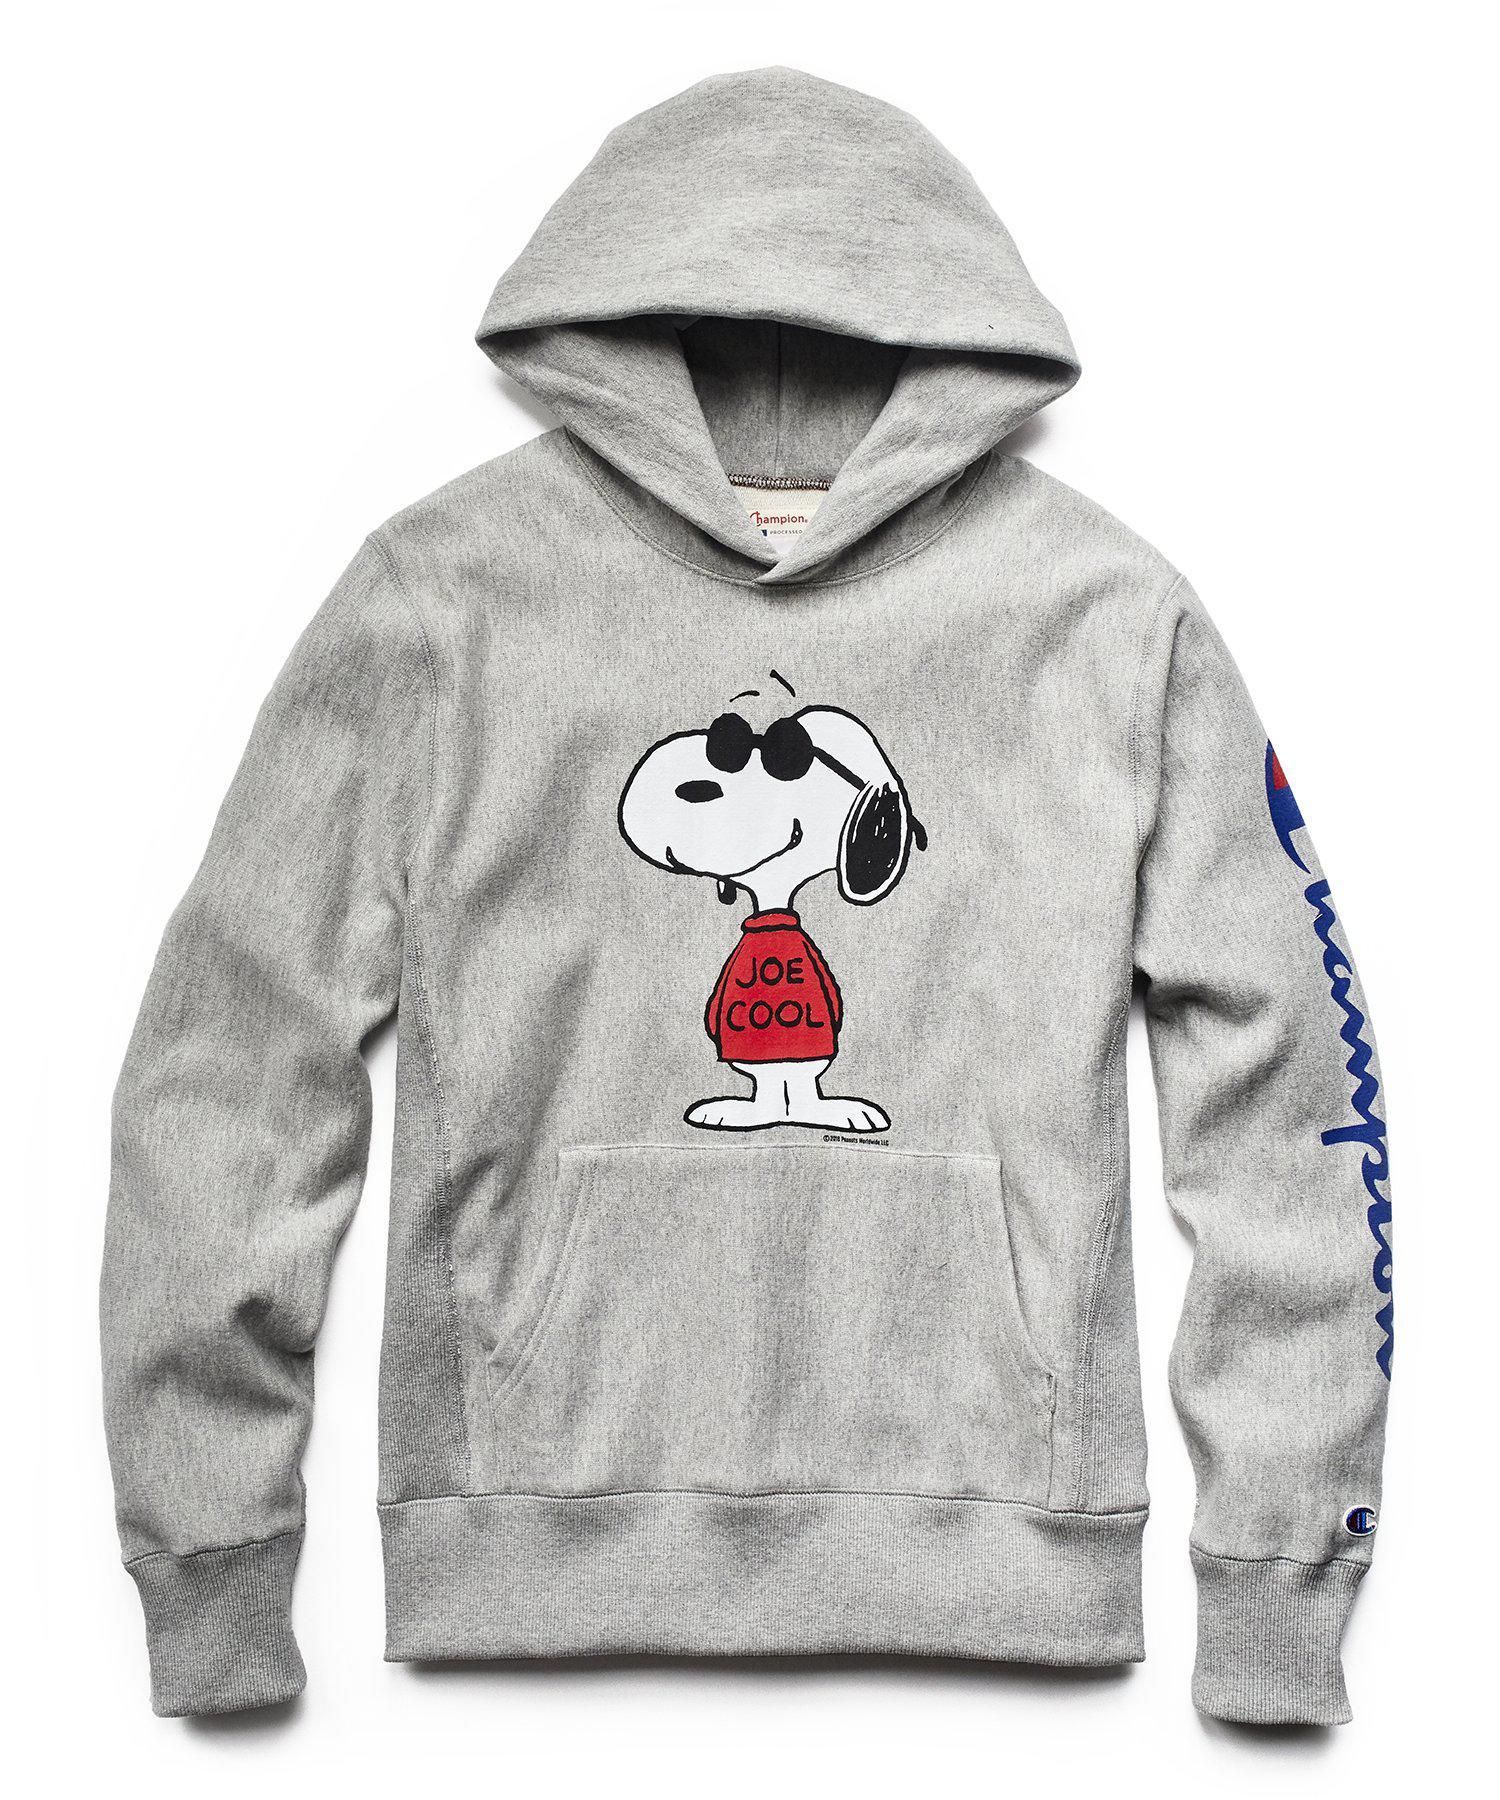 b10688b6a85b Todd Snyder Champion X Peanuts Joe Cool Hoodie In Light Grey Mix in ...